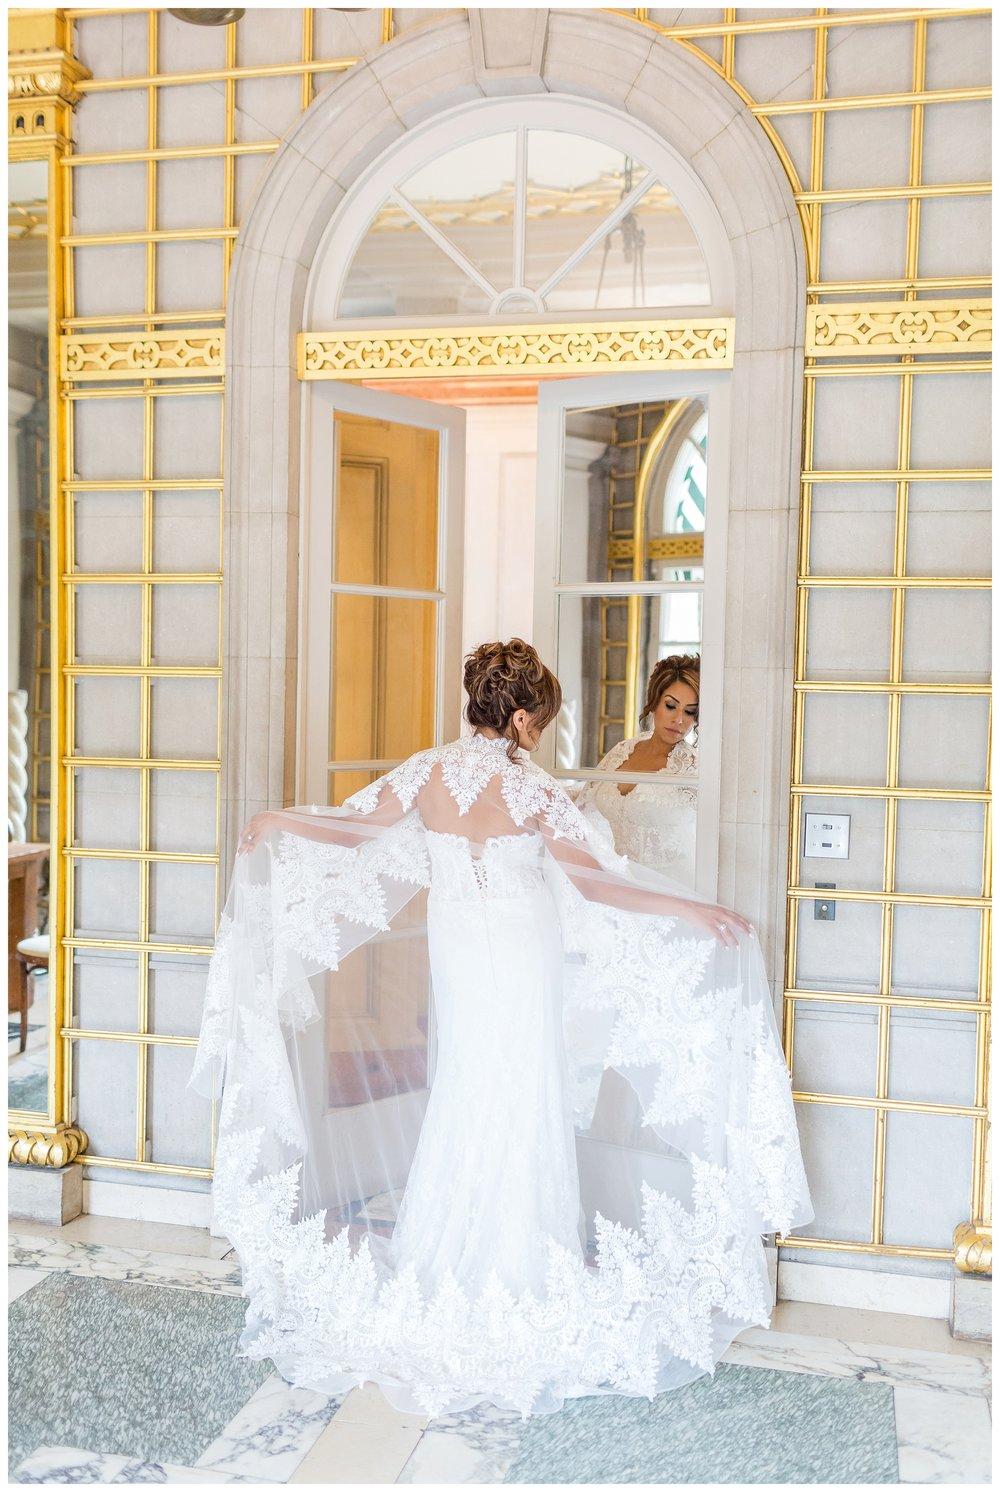 Anderson House Wedding DC Wedding Photographer Kir Tuben_0047.jpg